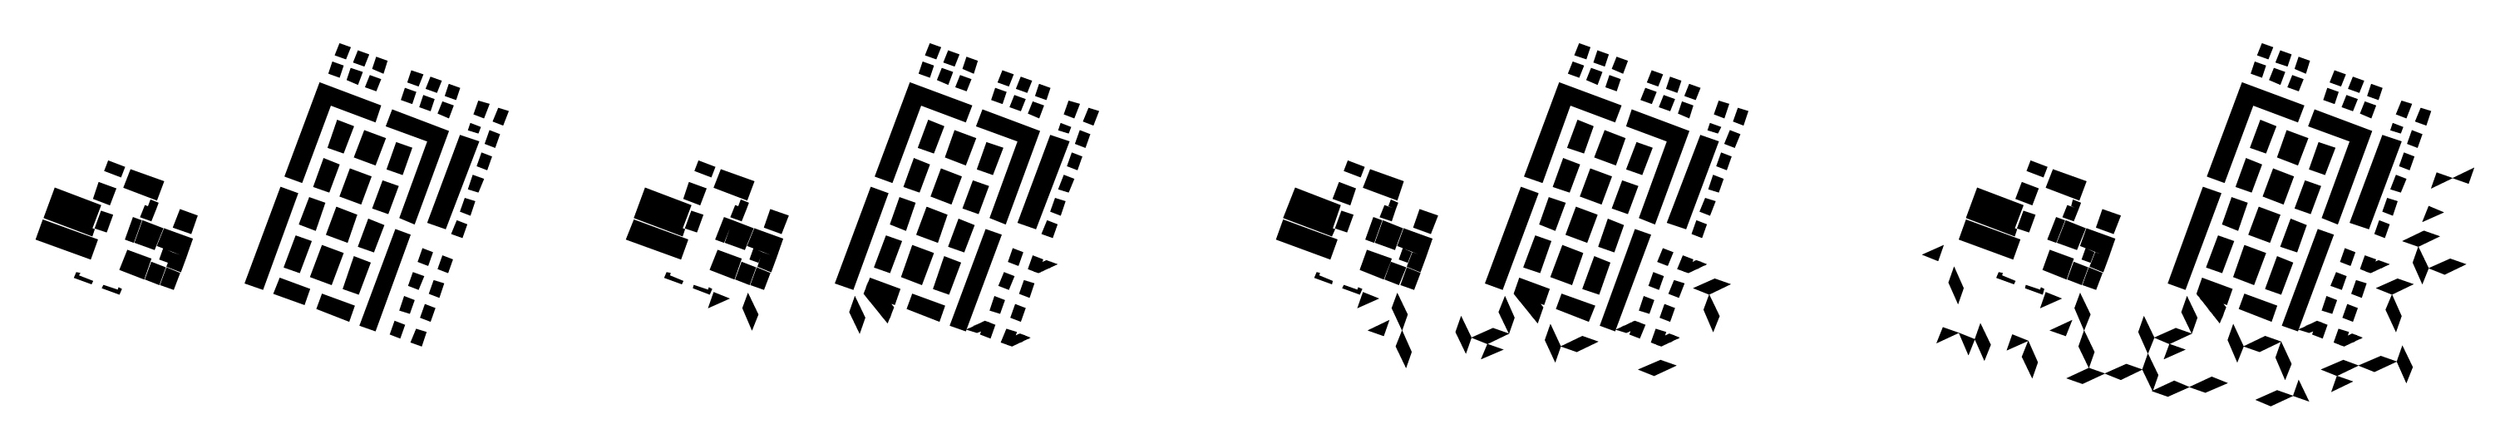 BA_pennine_diagram pattern distort.jpg